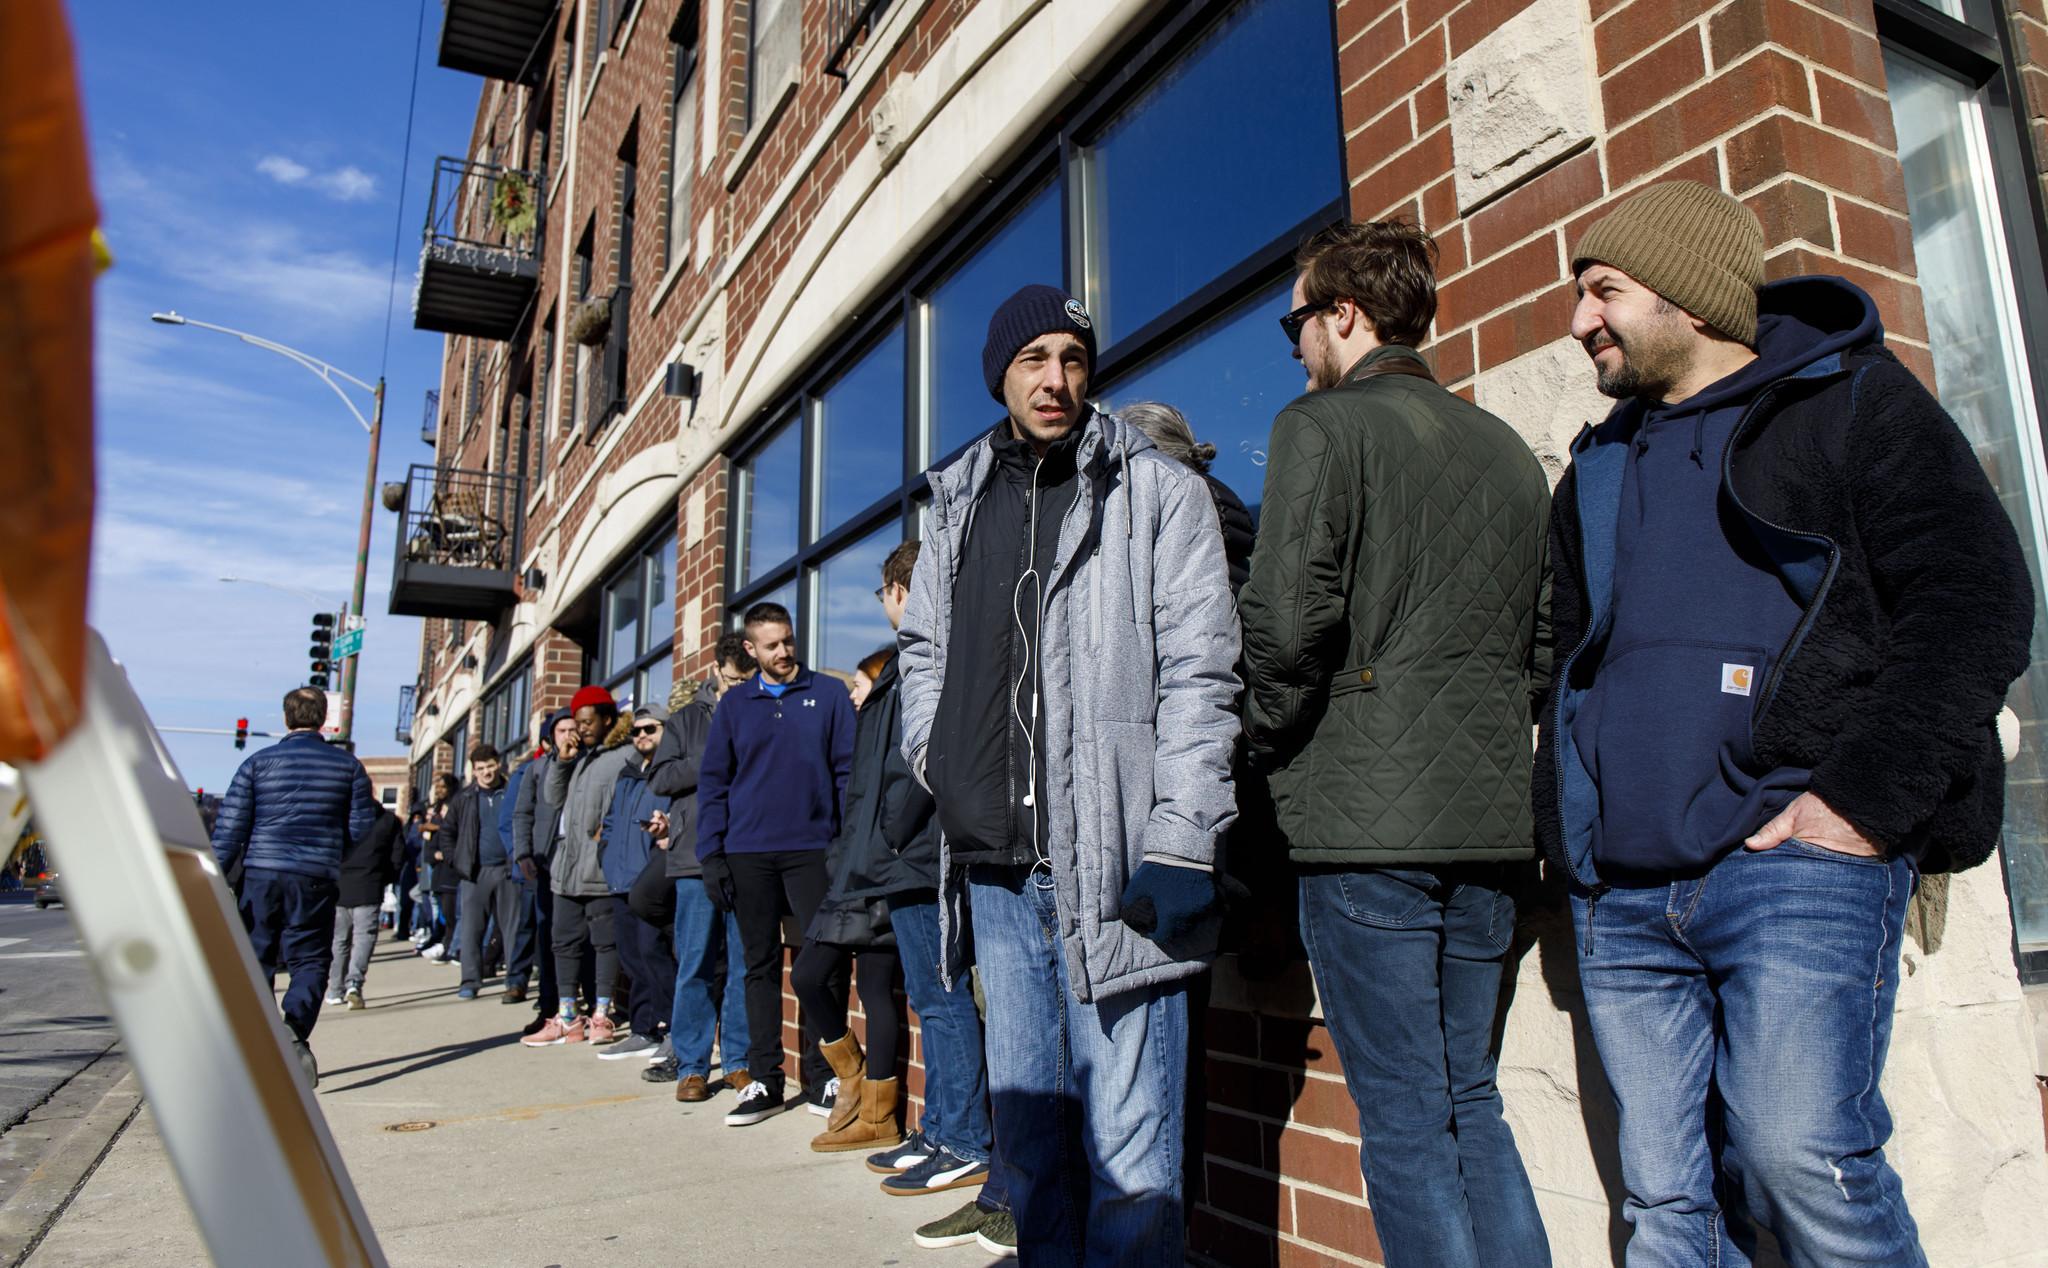 Illinois Raises Over $10 Million of Tax Revenue in January